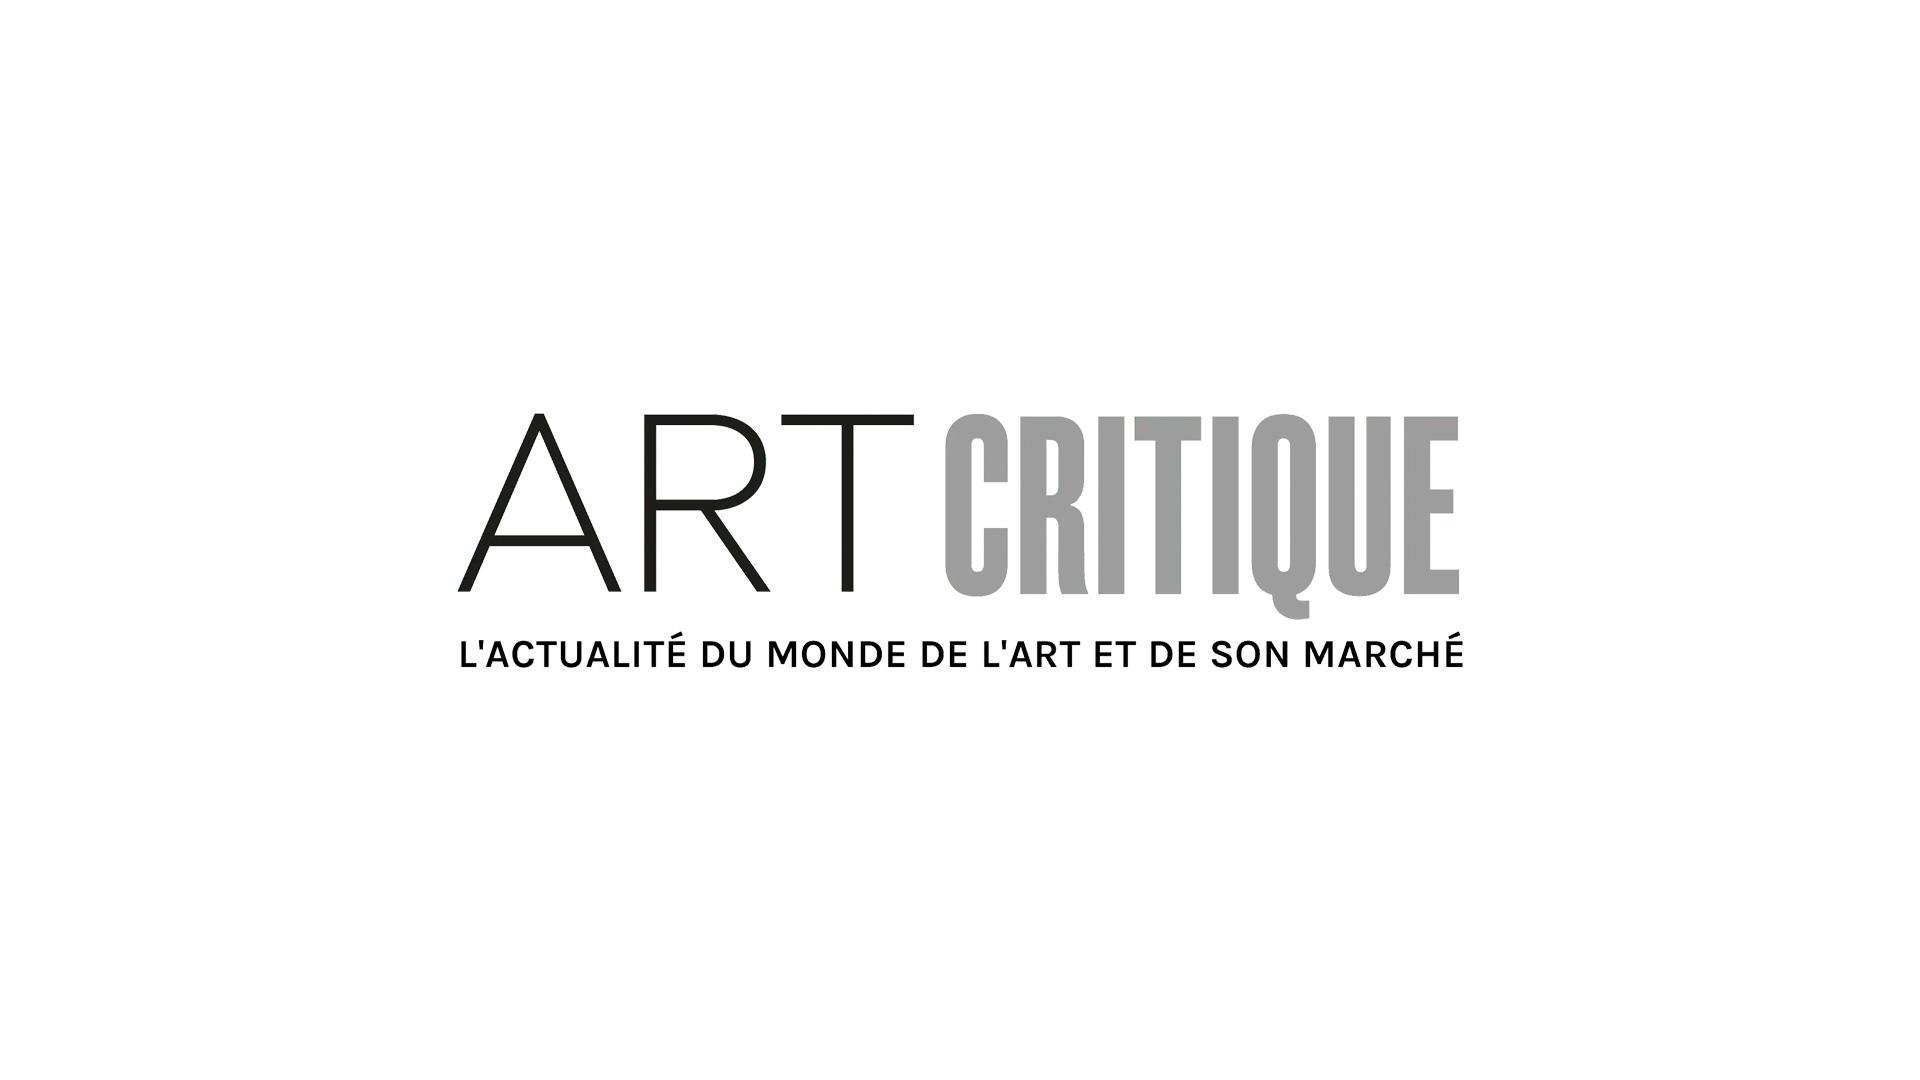 'Put it back': San Francisco house by architect Richard Neutra to be rebuilt